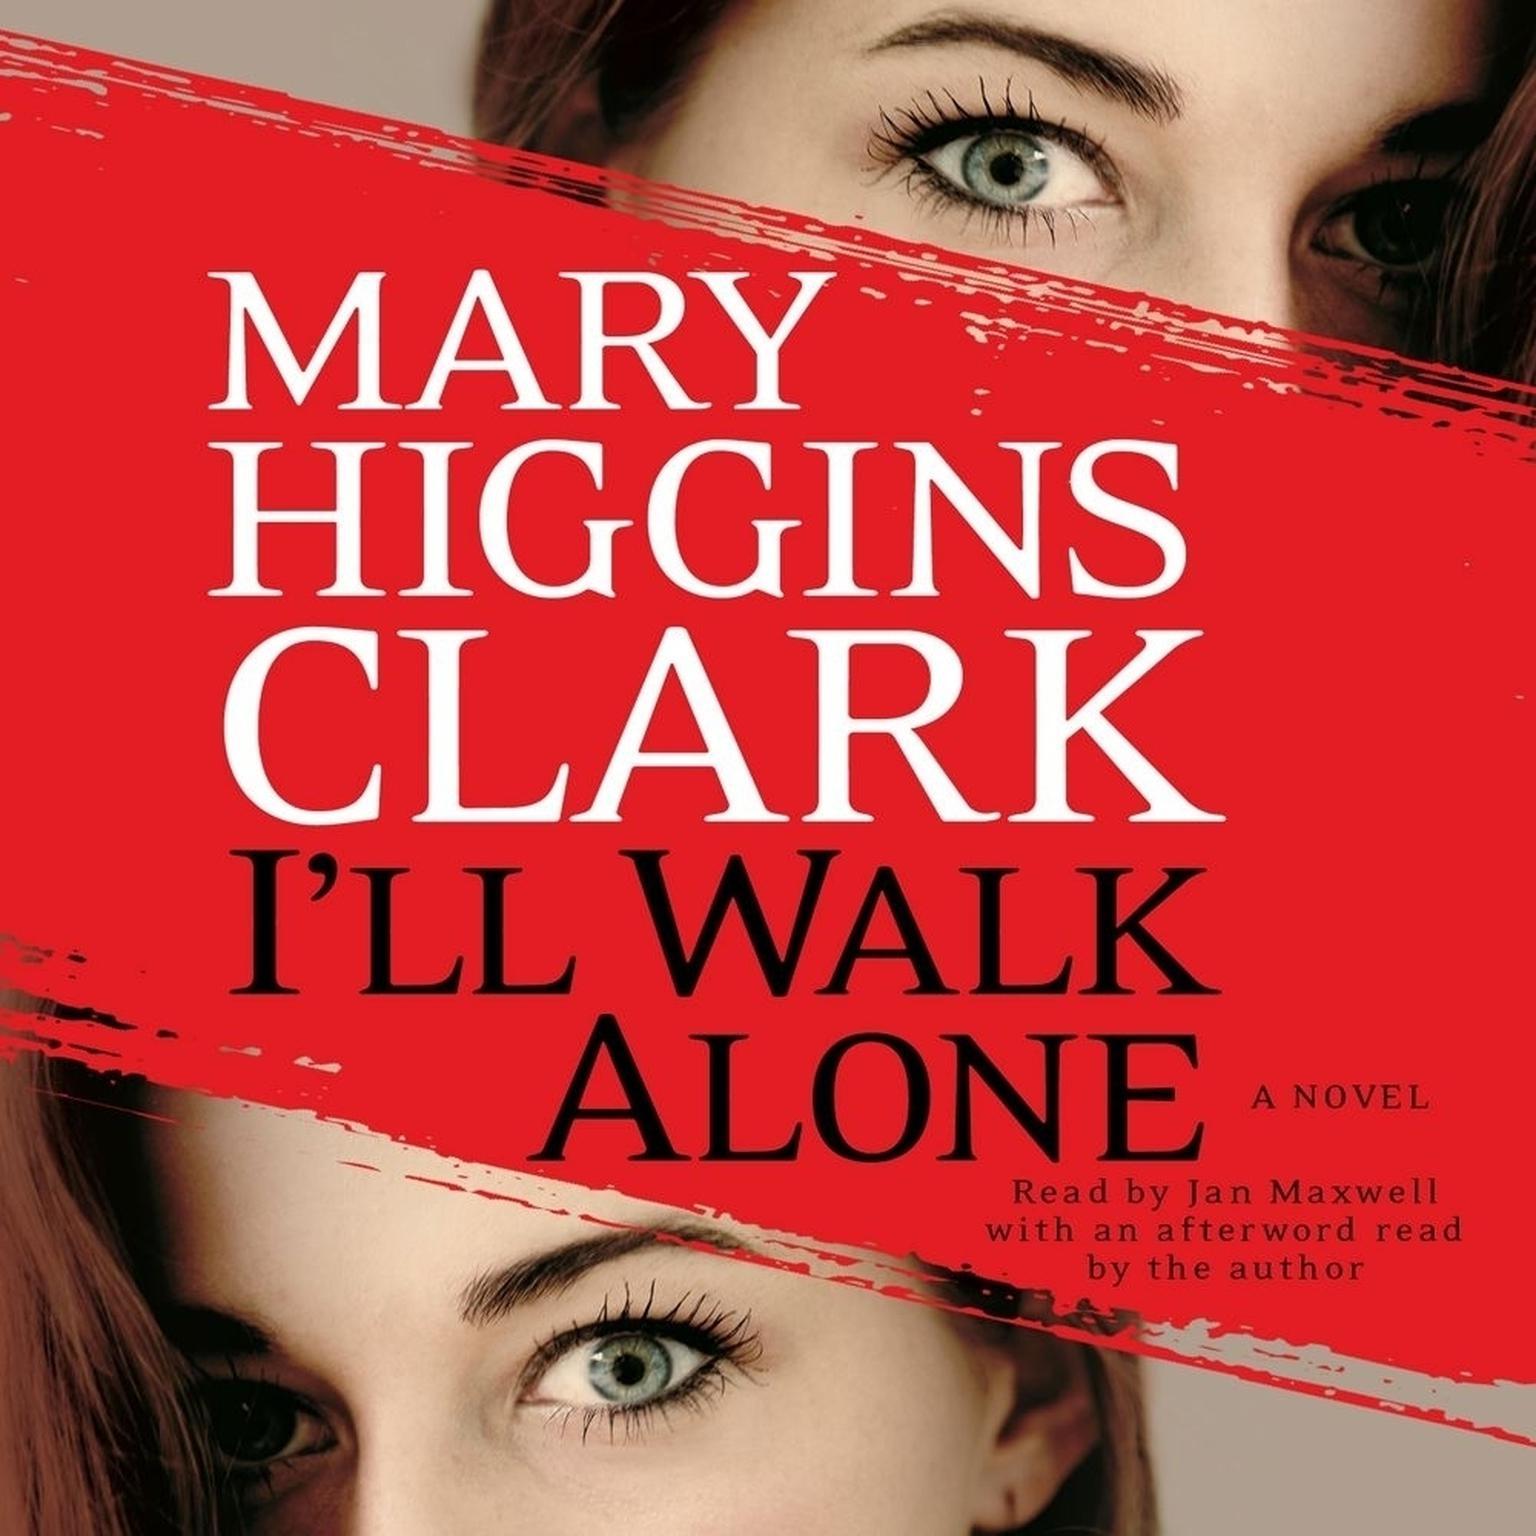 Printable I'll Walk Alone (Abridged): A Novel Audiobook Cover Art